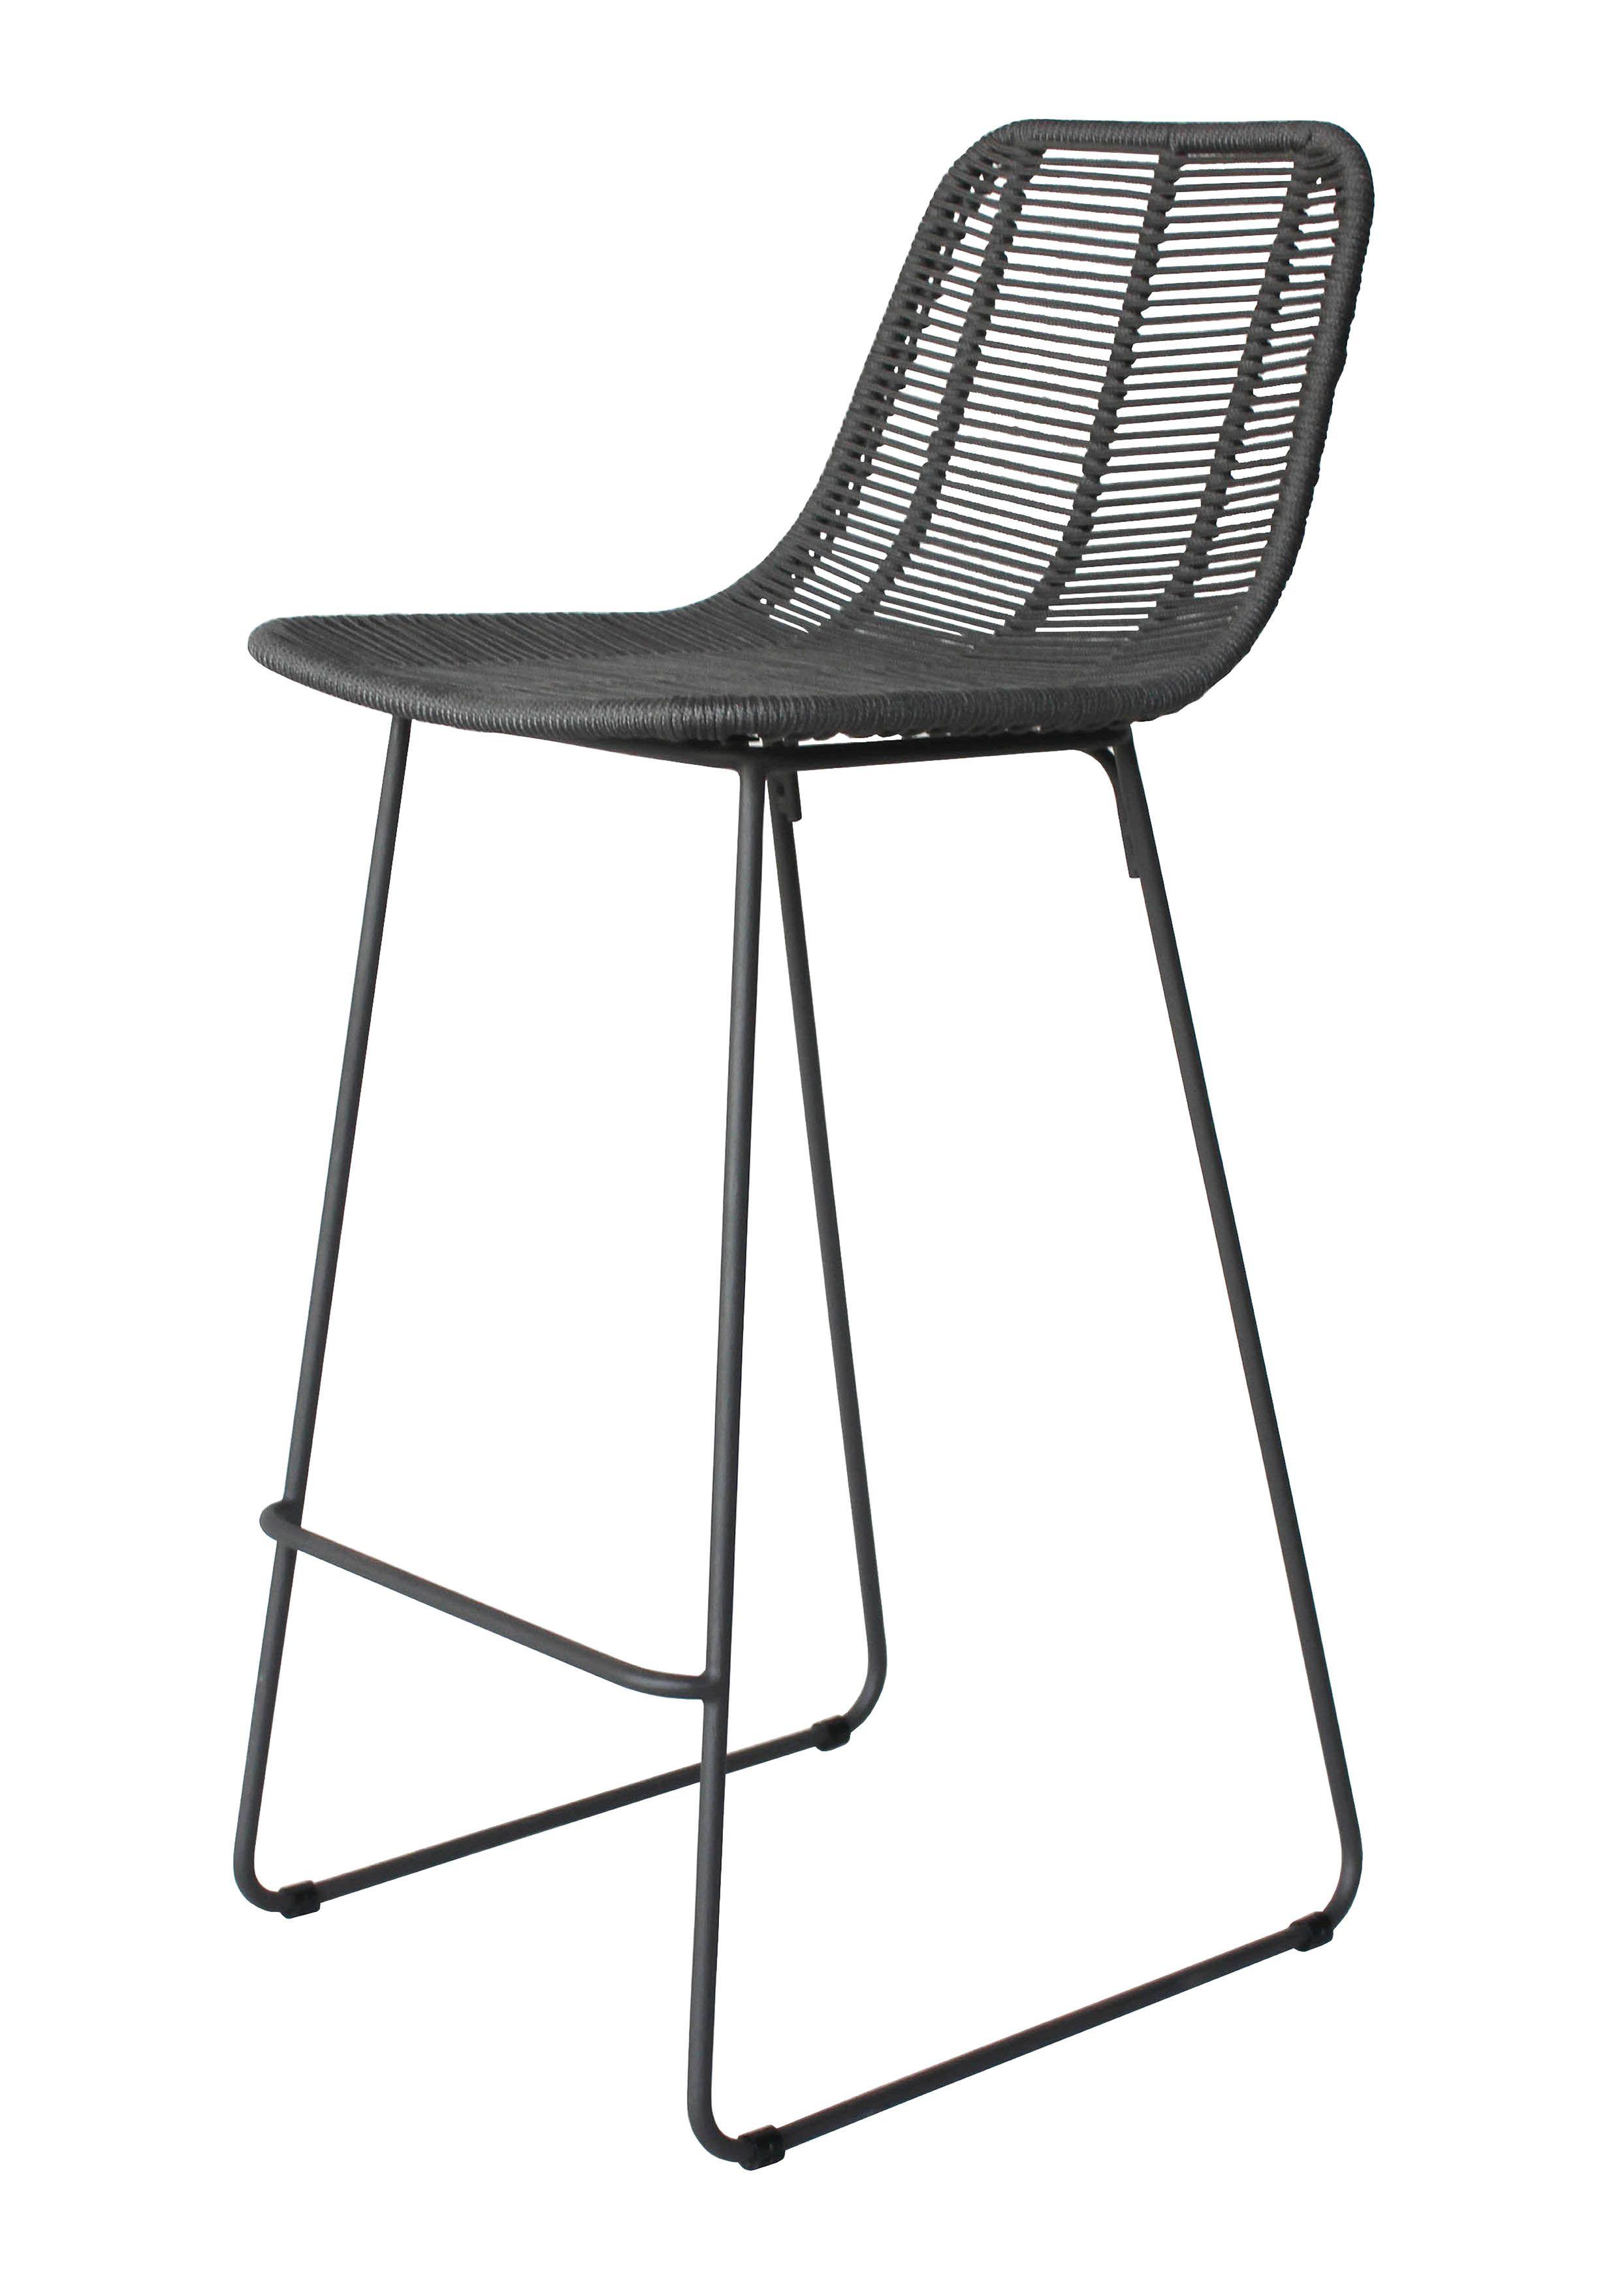 Enjoyable Kulu Rope Barstool Kitchen Ideas Outdoor Bar Stools Ibusinesslaw Wood Chair Design Ideas Ibusinesslaworg